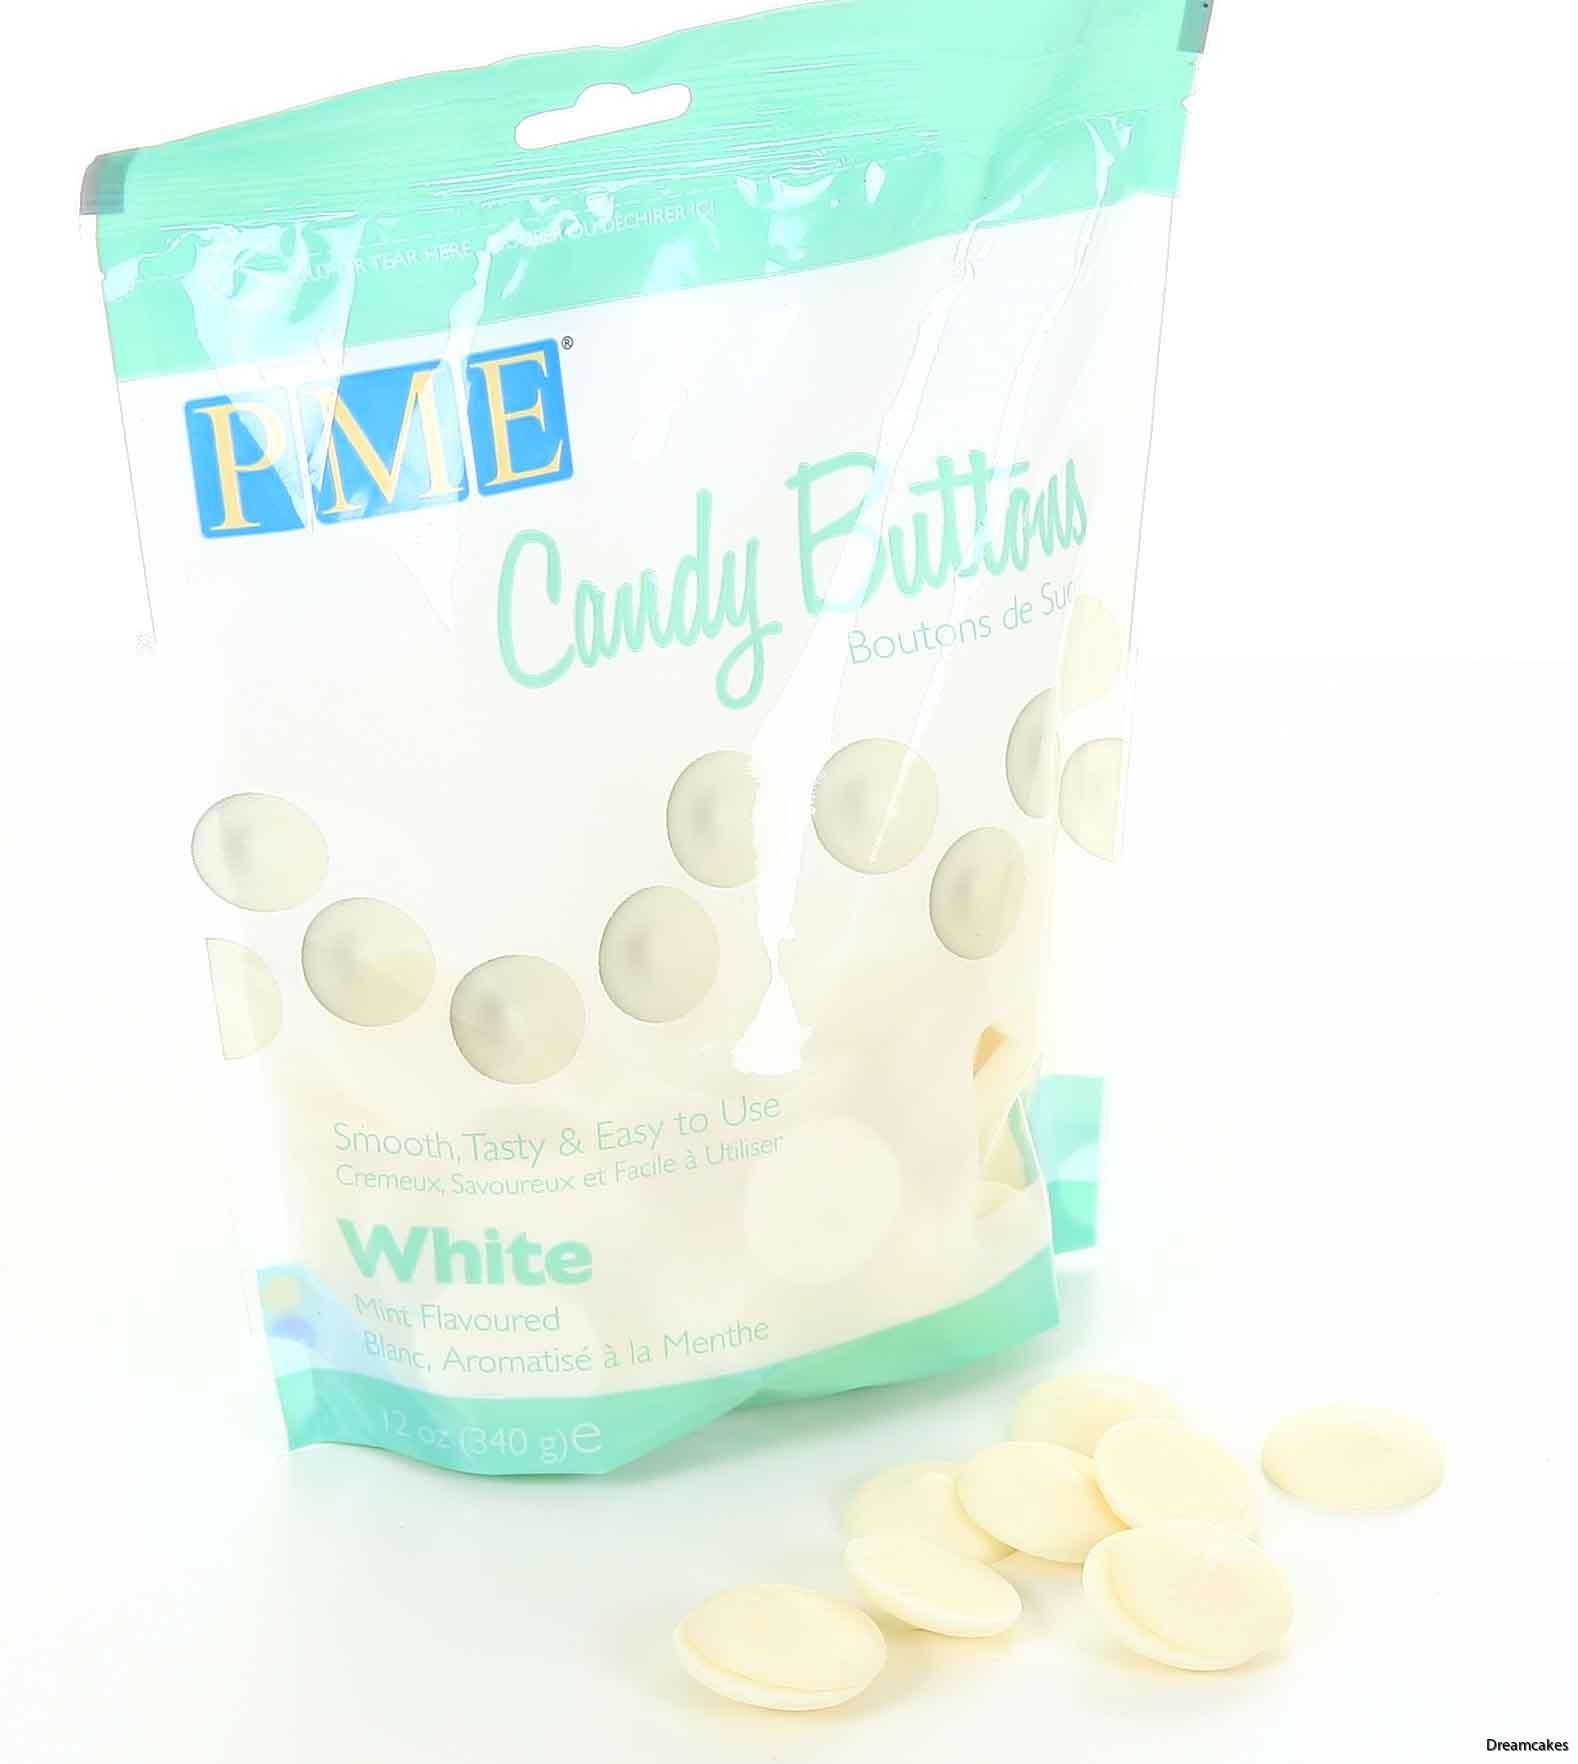 vit choklad för cakepops, candy buttons, vit choklad för bakning, mintchoklad, vit choklad med mintsmak